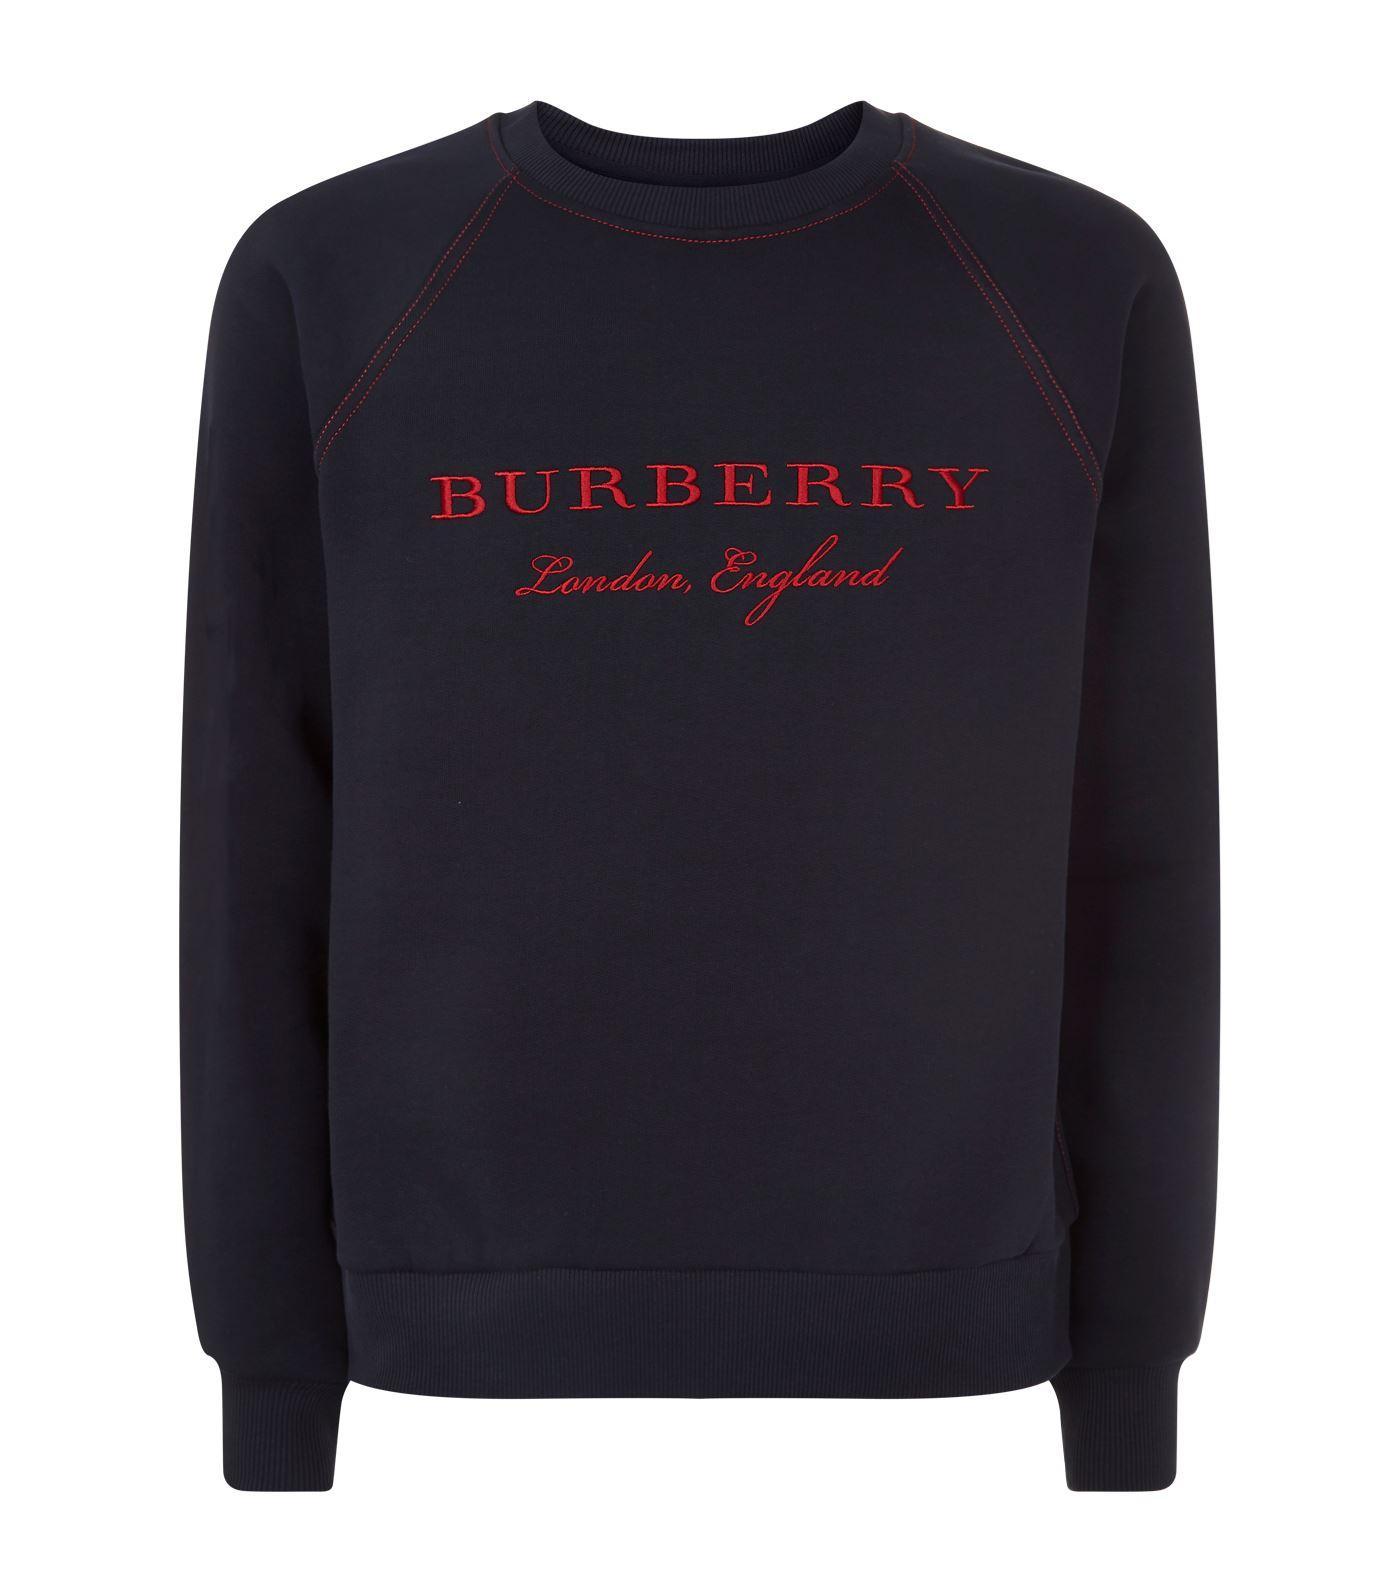 Burberry Contrasting Stitching Wool Sweatshirt In Navy